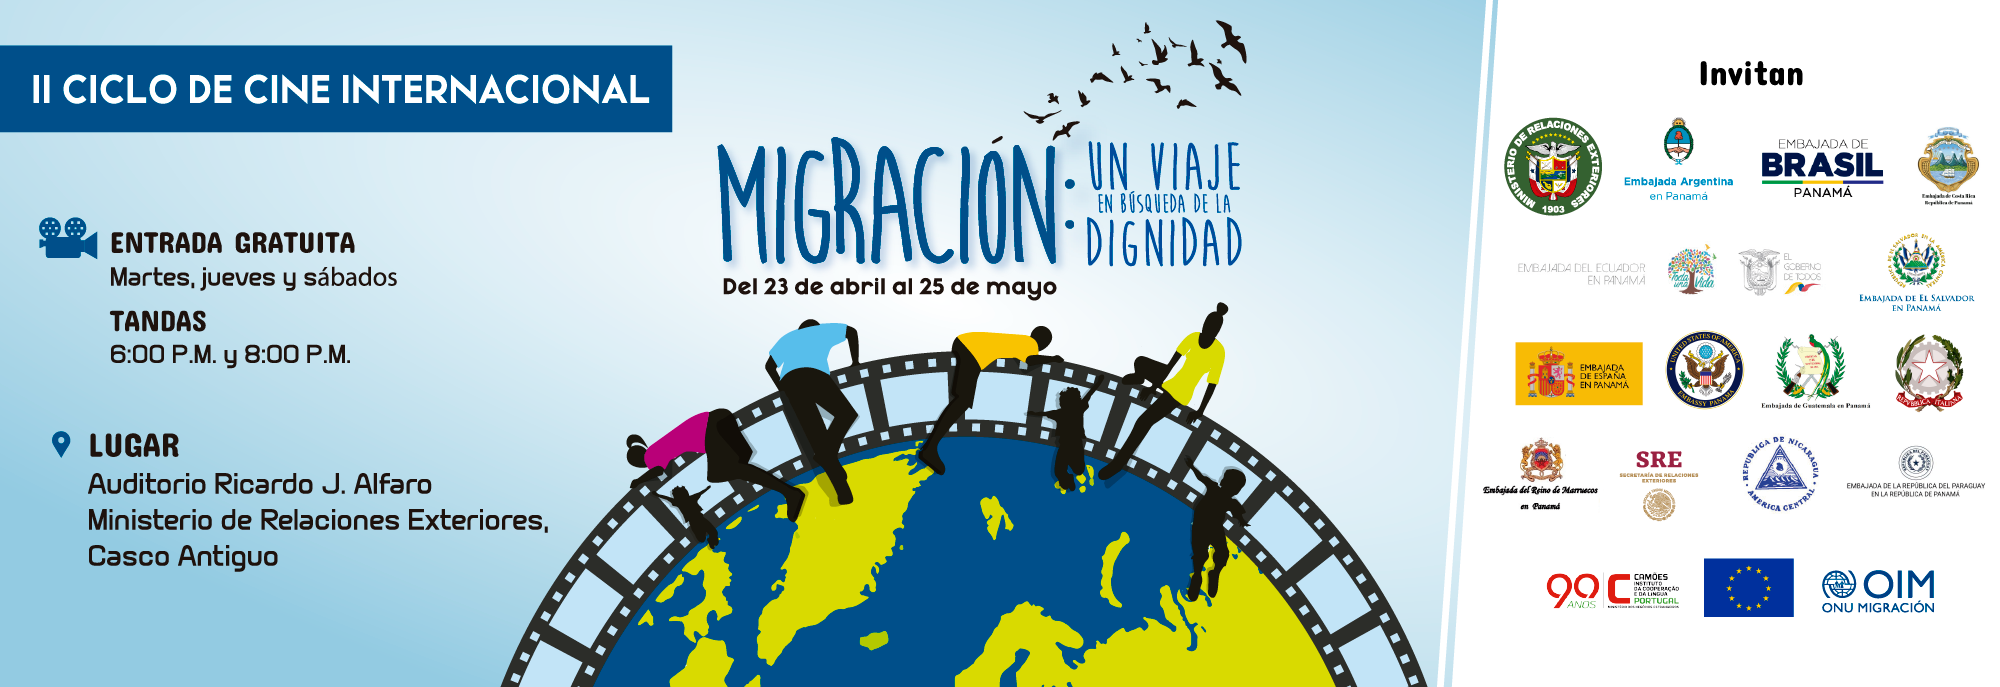 Banner-Web-Migracion2